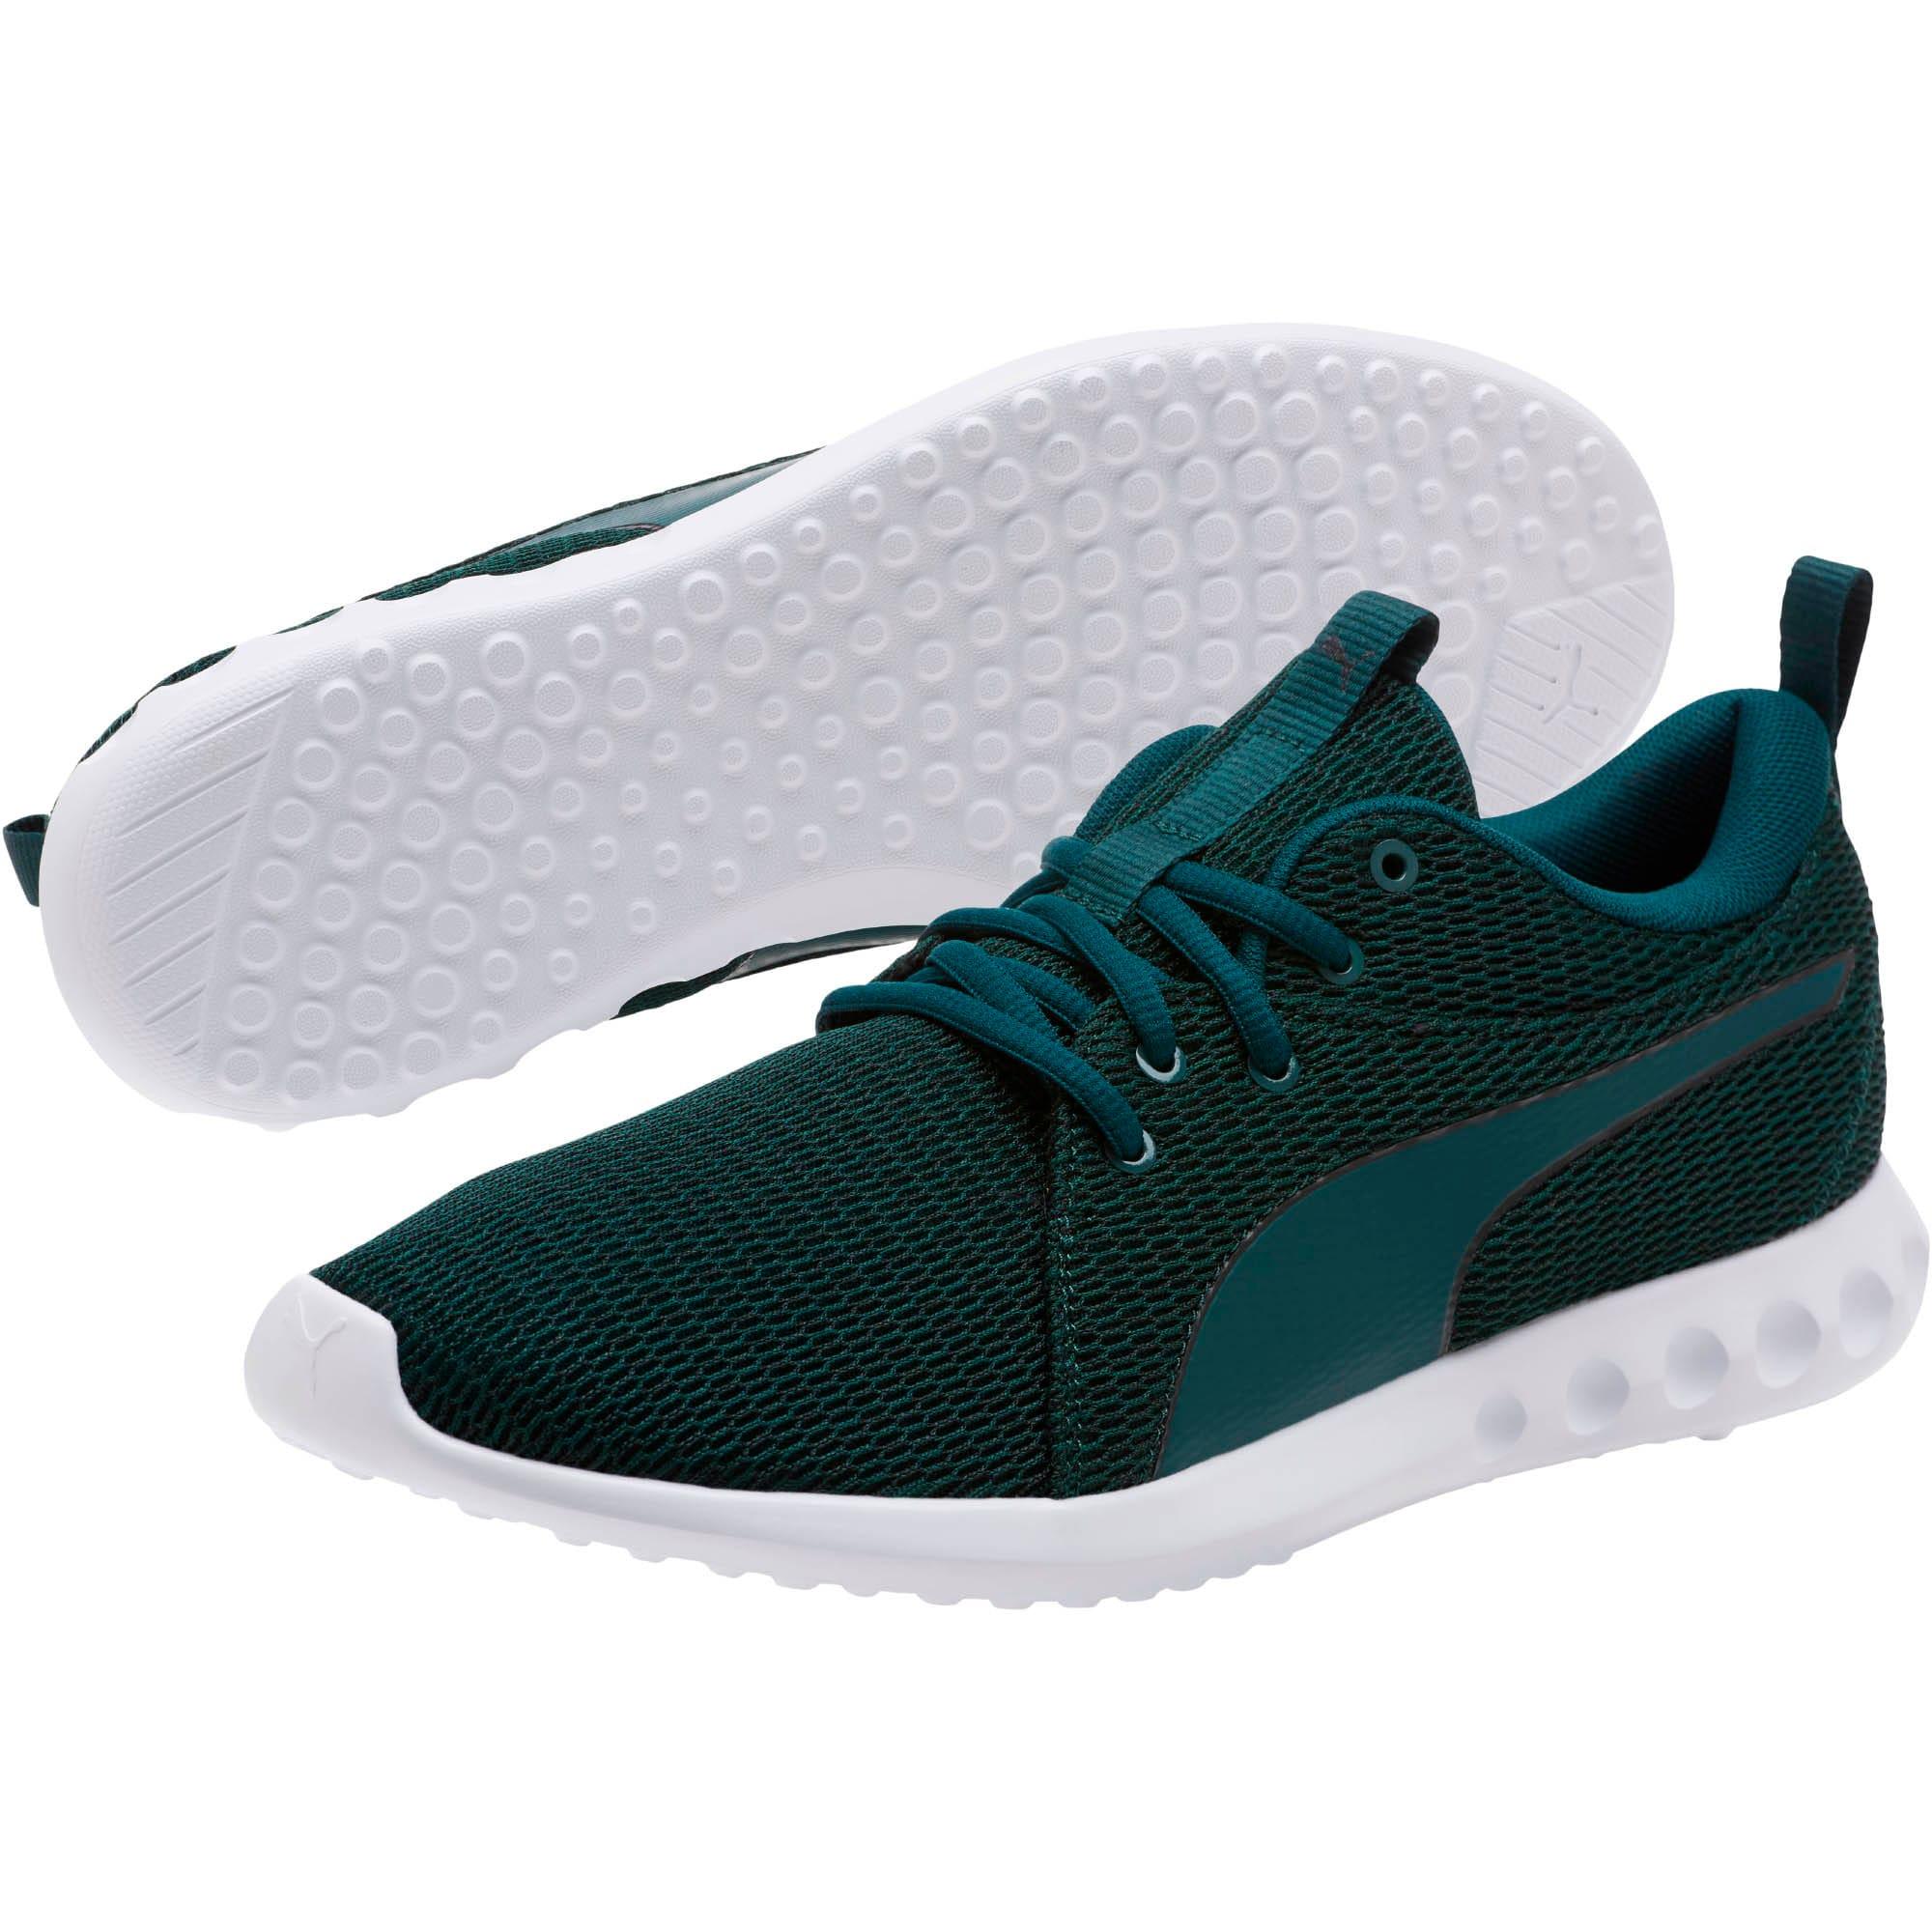 Miniatura 2 de Zapatos para correrCarson 2 New Corepara hombre, Ponderosa Pine-Puma White, mediano